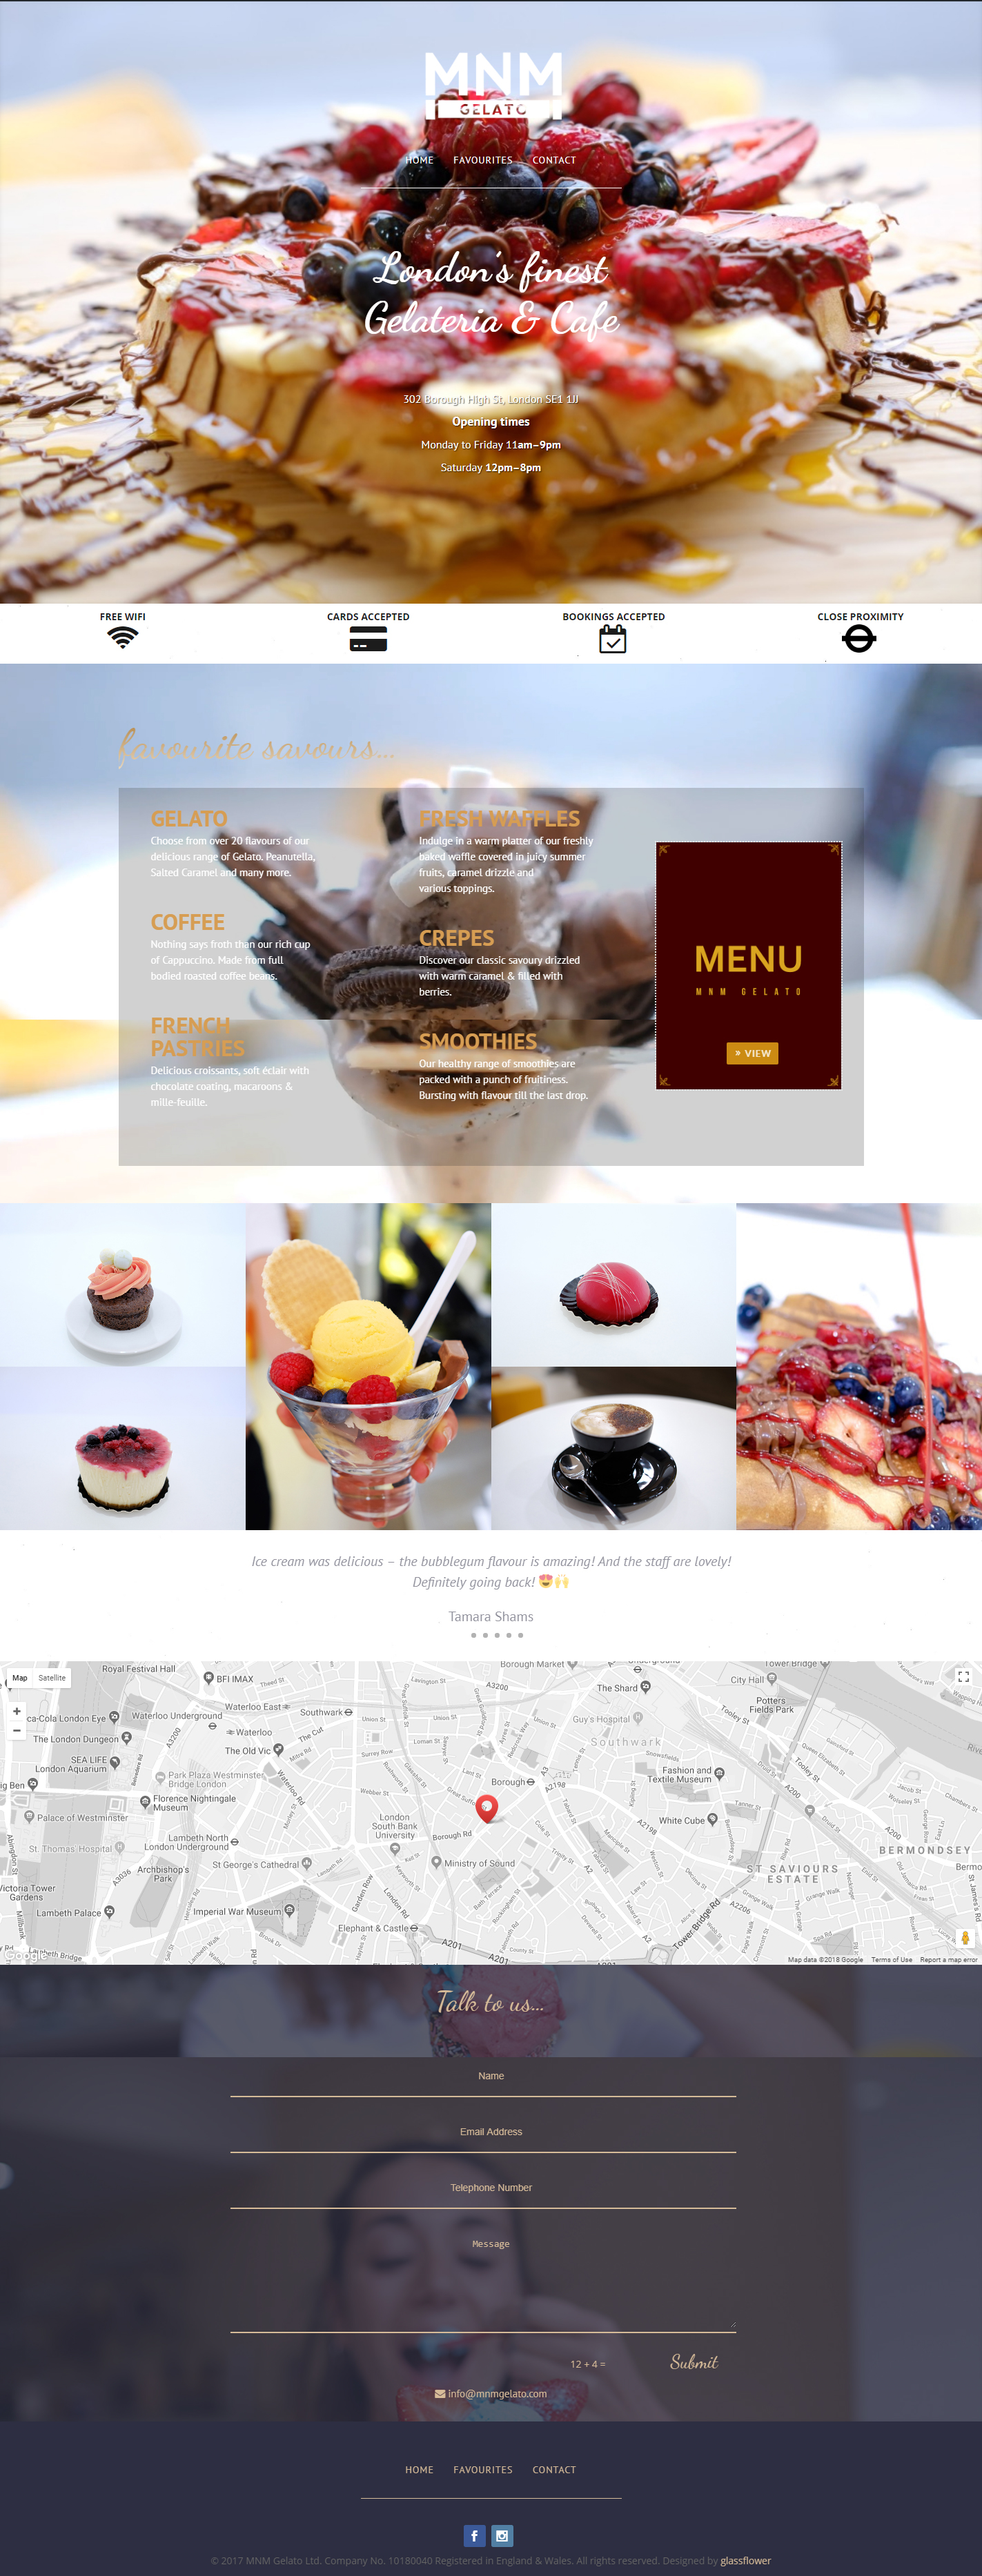 MNM-Website